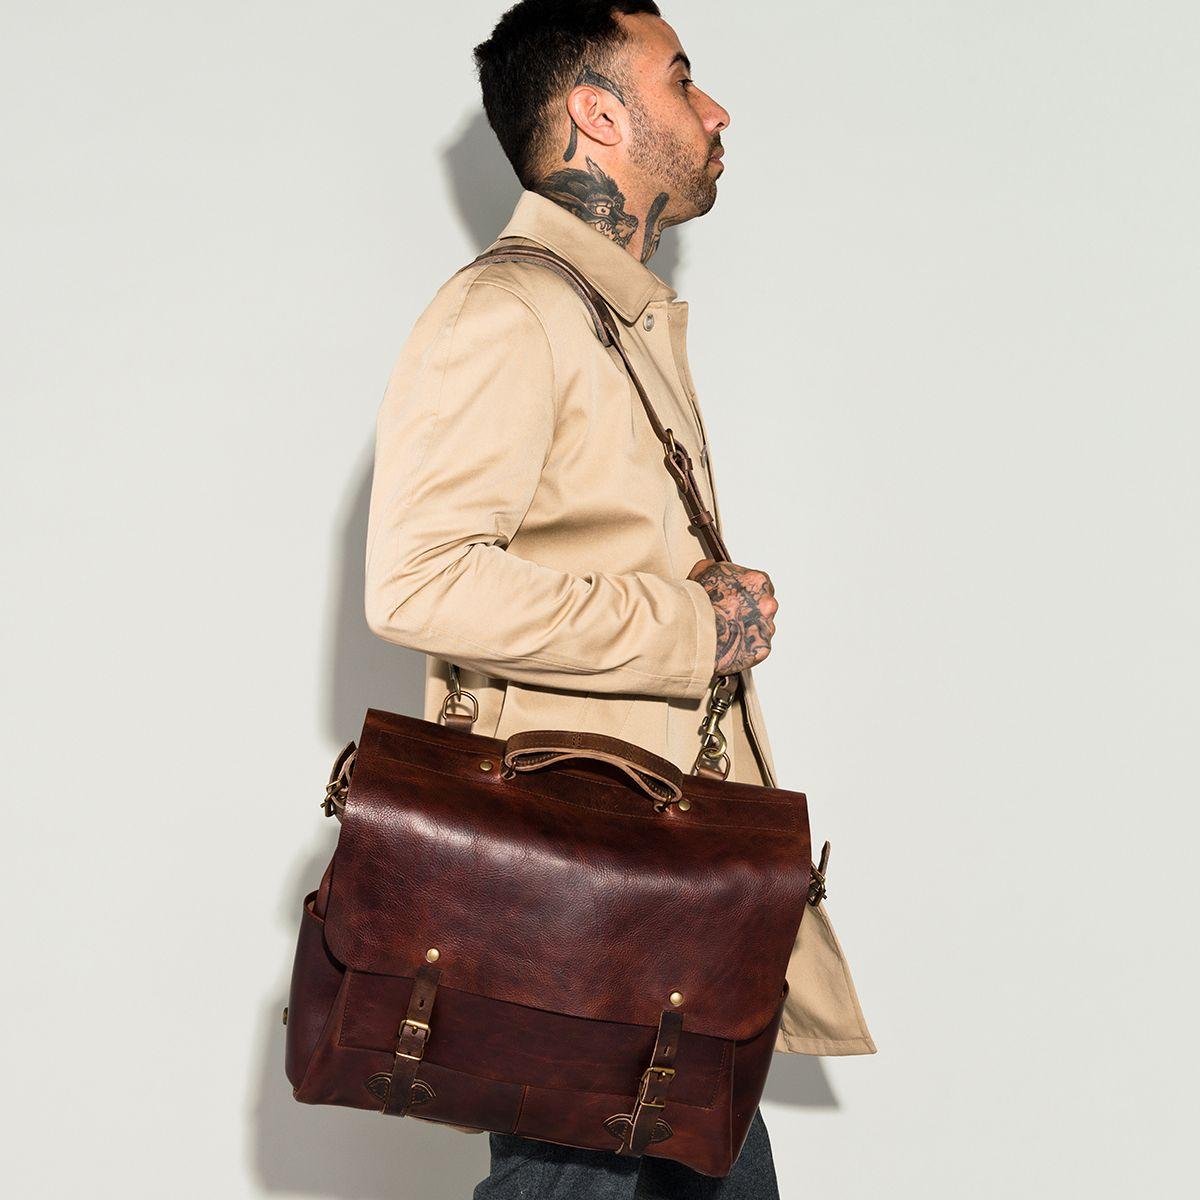 in France business Bag Made de 48H bag Chauffe Irving Irving Bleu Sac 48H Postman 74WOC76